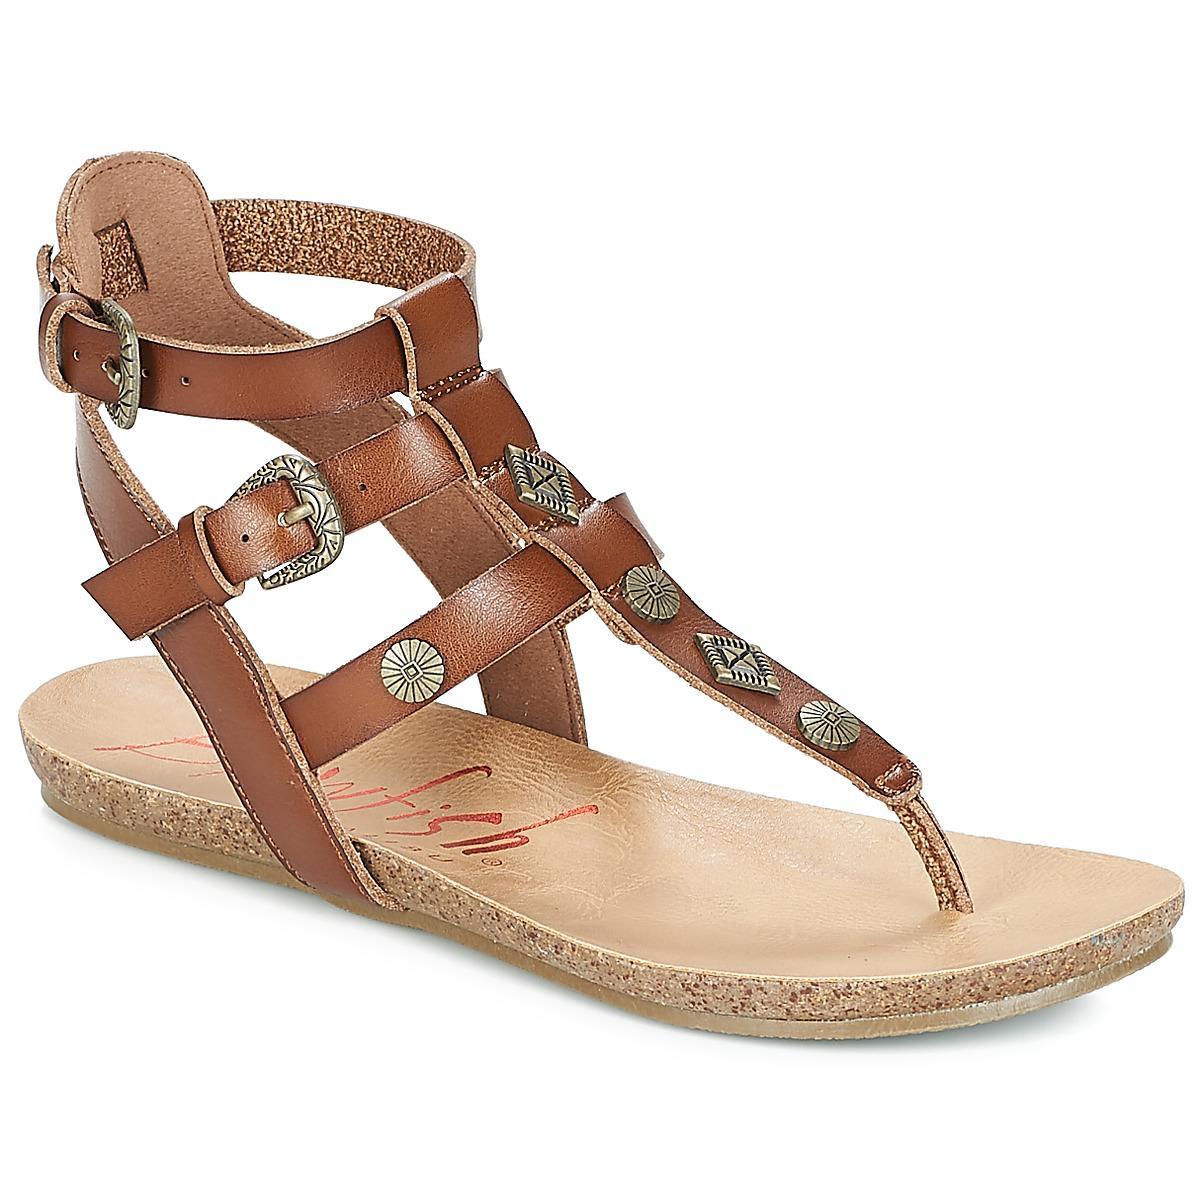 88630ff40b9 Blowfish Malibu Glamm Sandals in Brown - Lyst